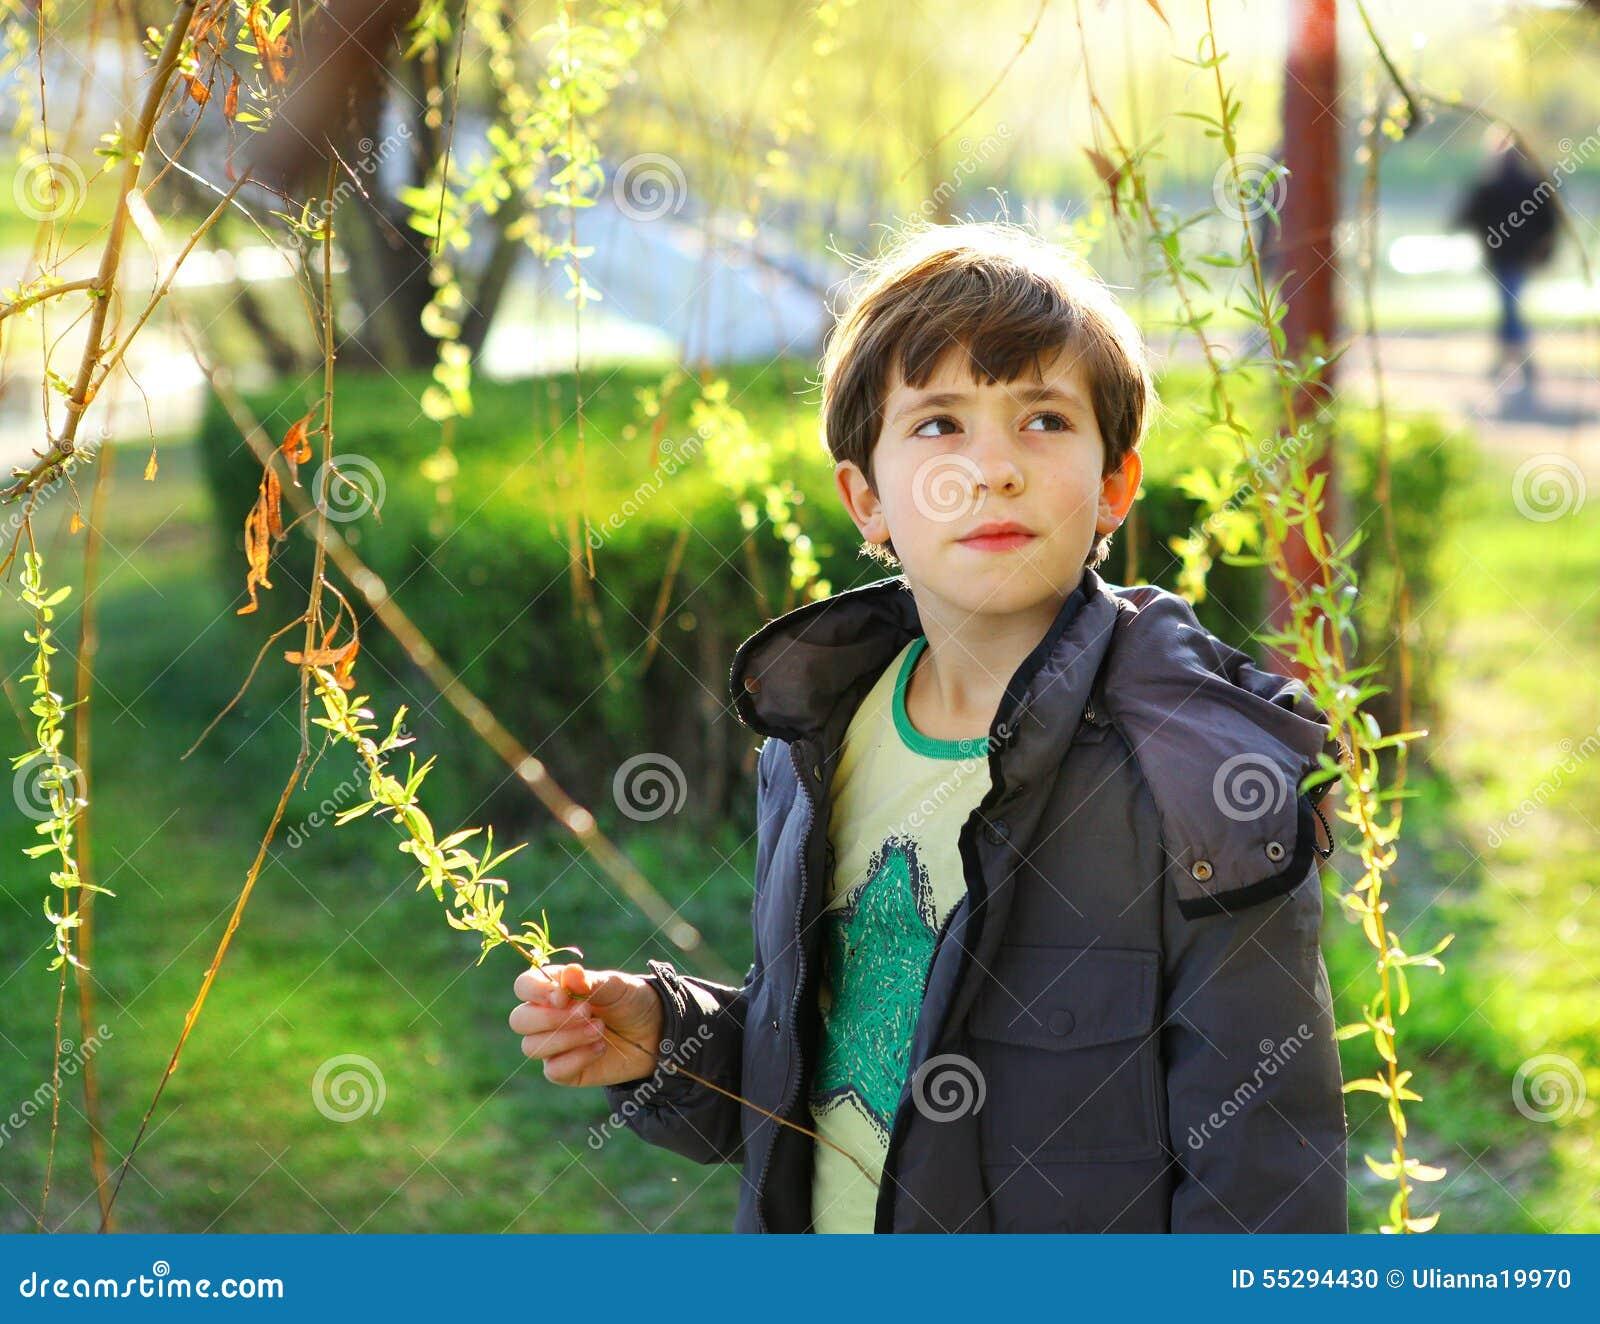 Retrato de Thoutful do menino considerável do preteen no CCB do parque da mola